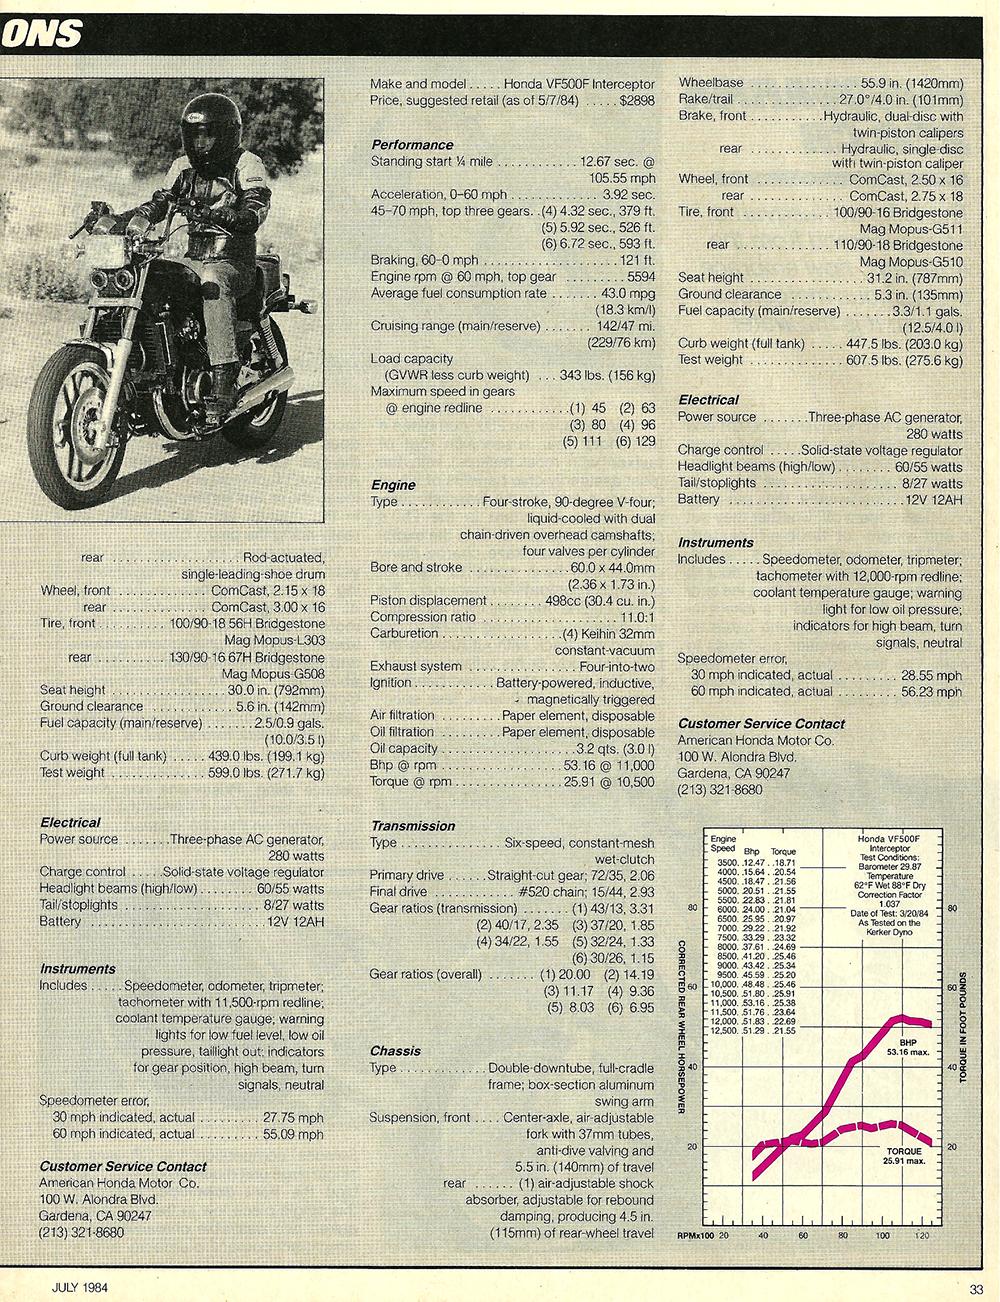 1984 Honda V30 Magna and VF500F Interceptor road test 10.jpg